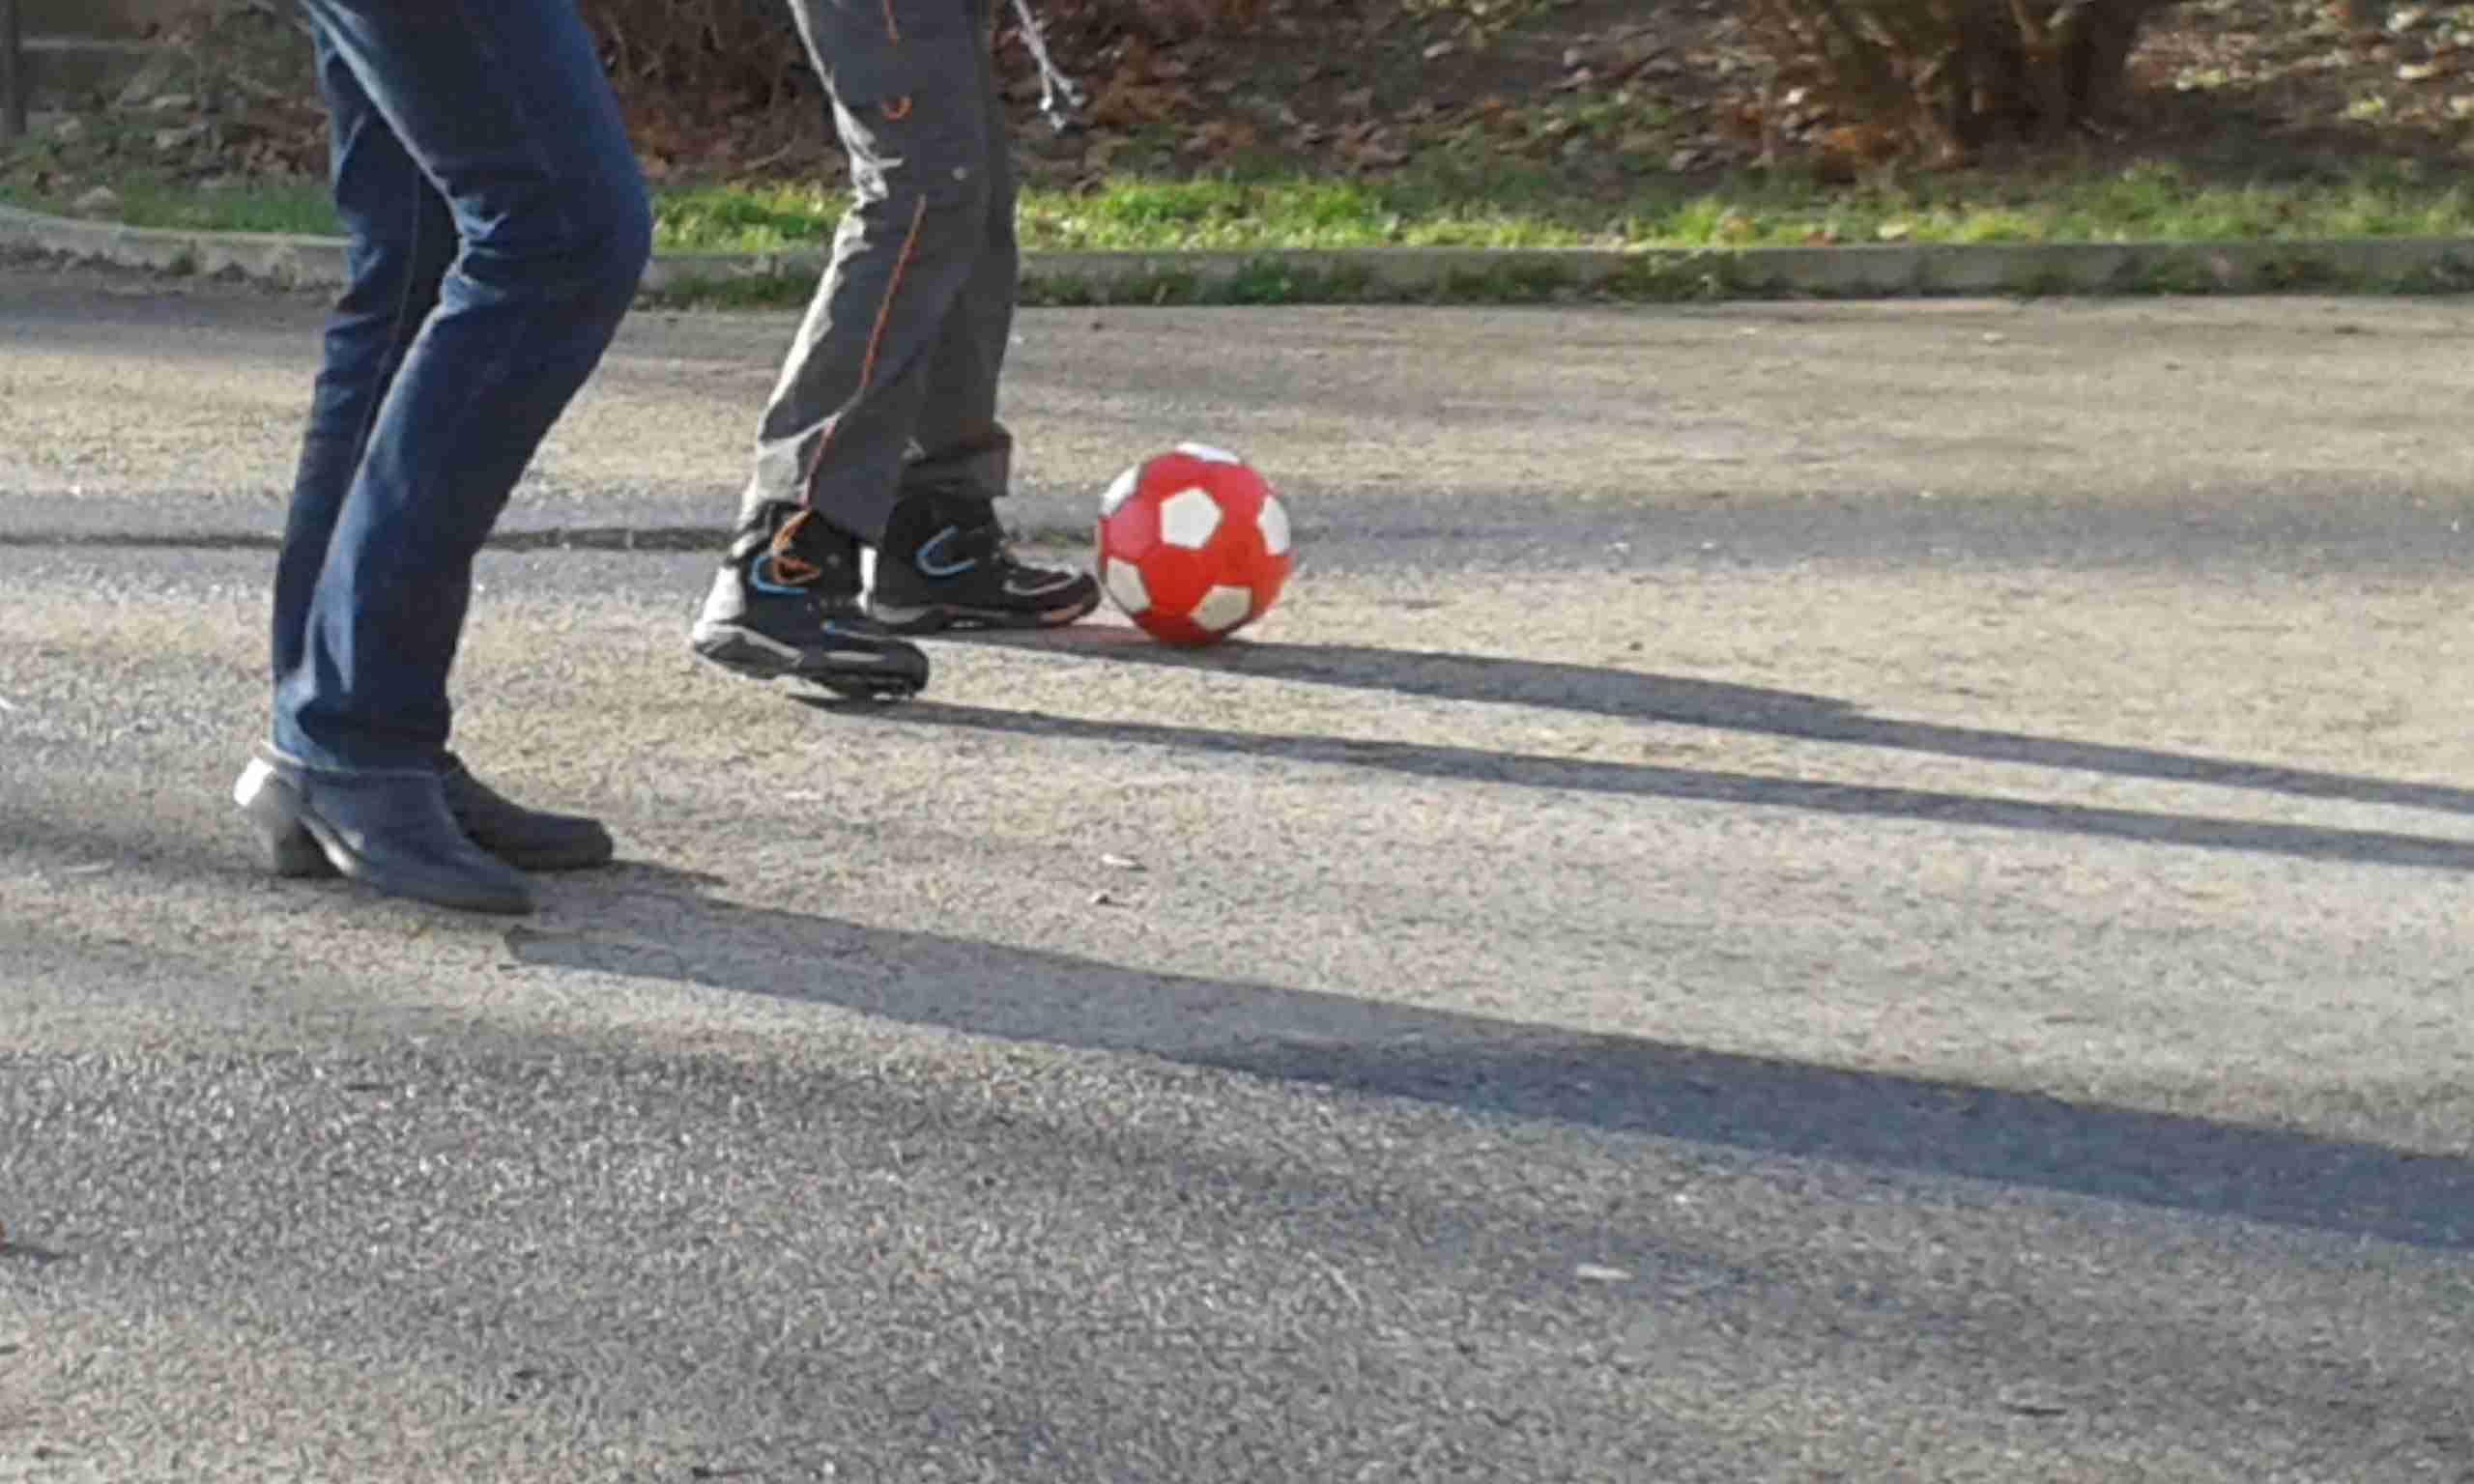 fotbal cili kopana